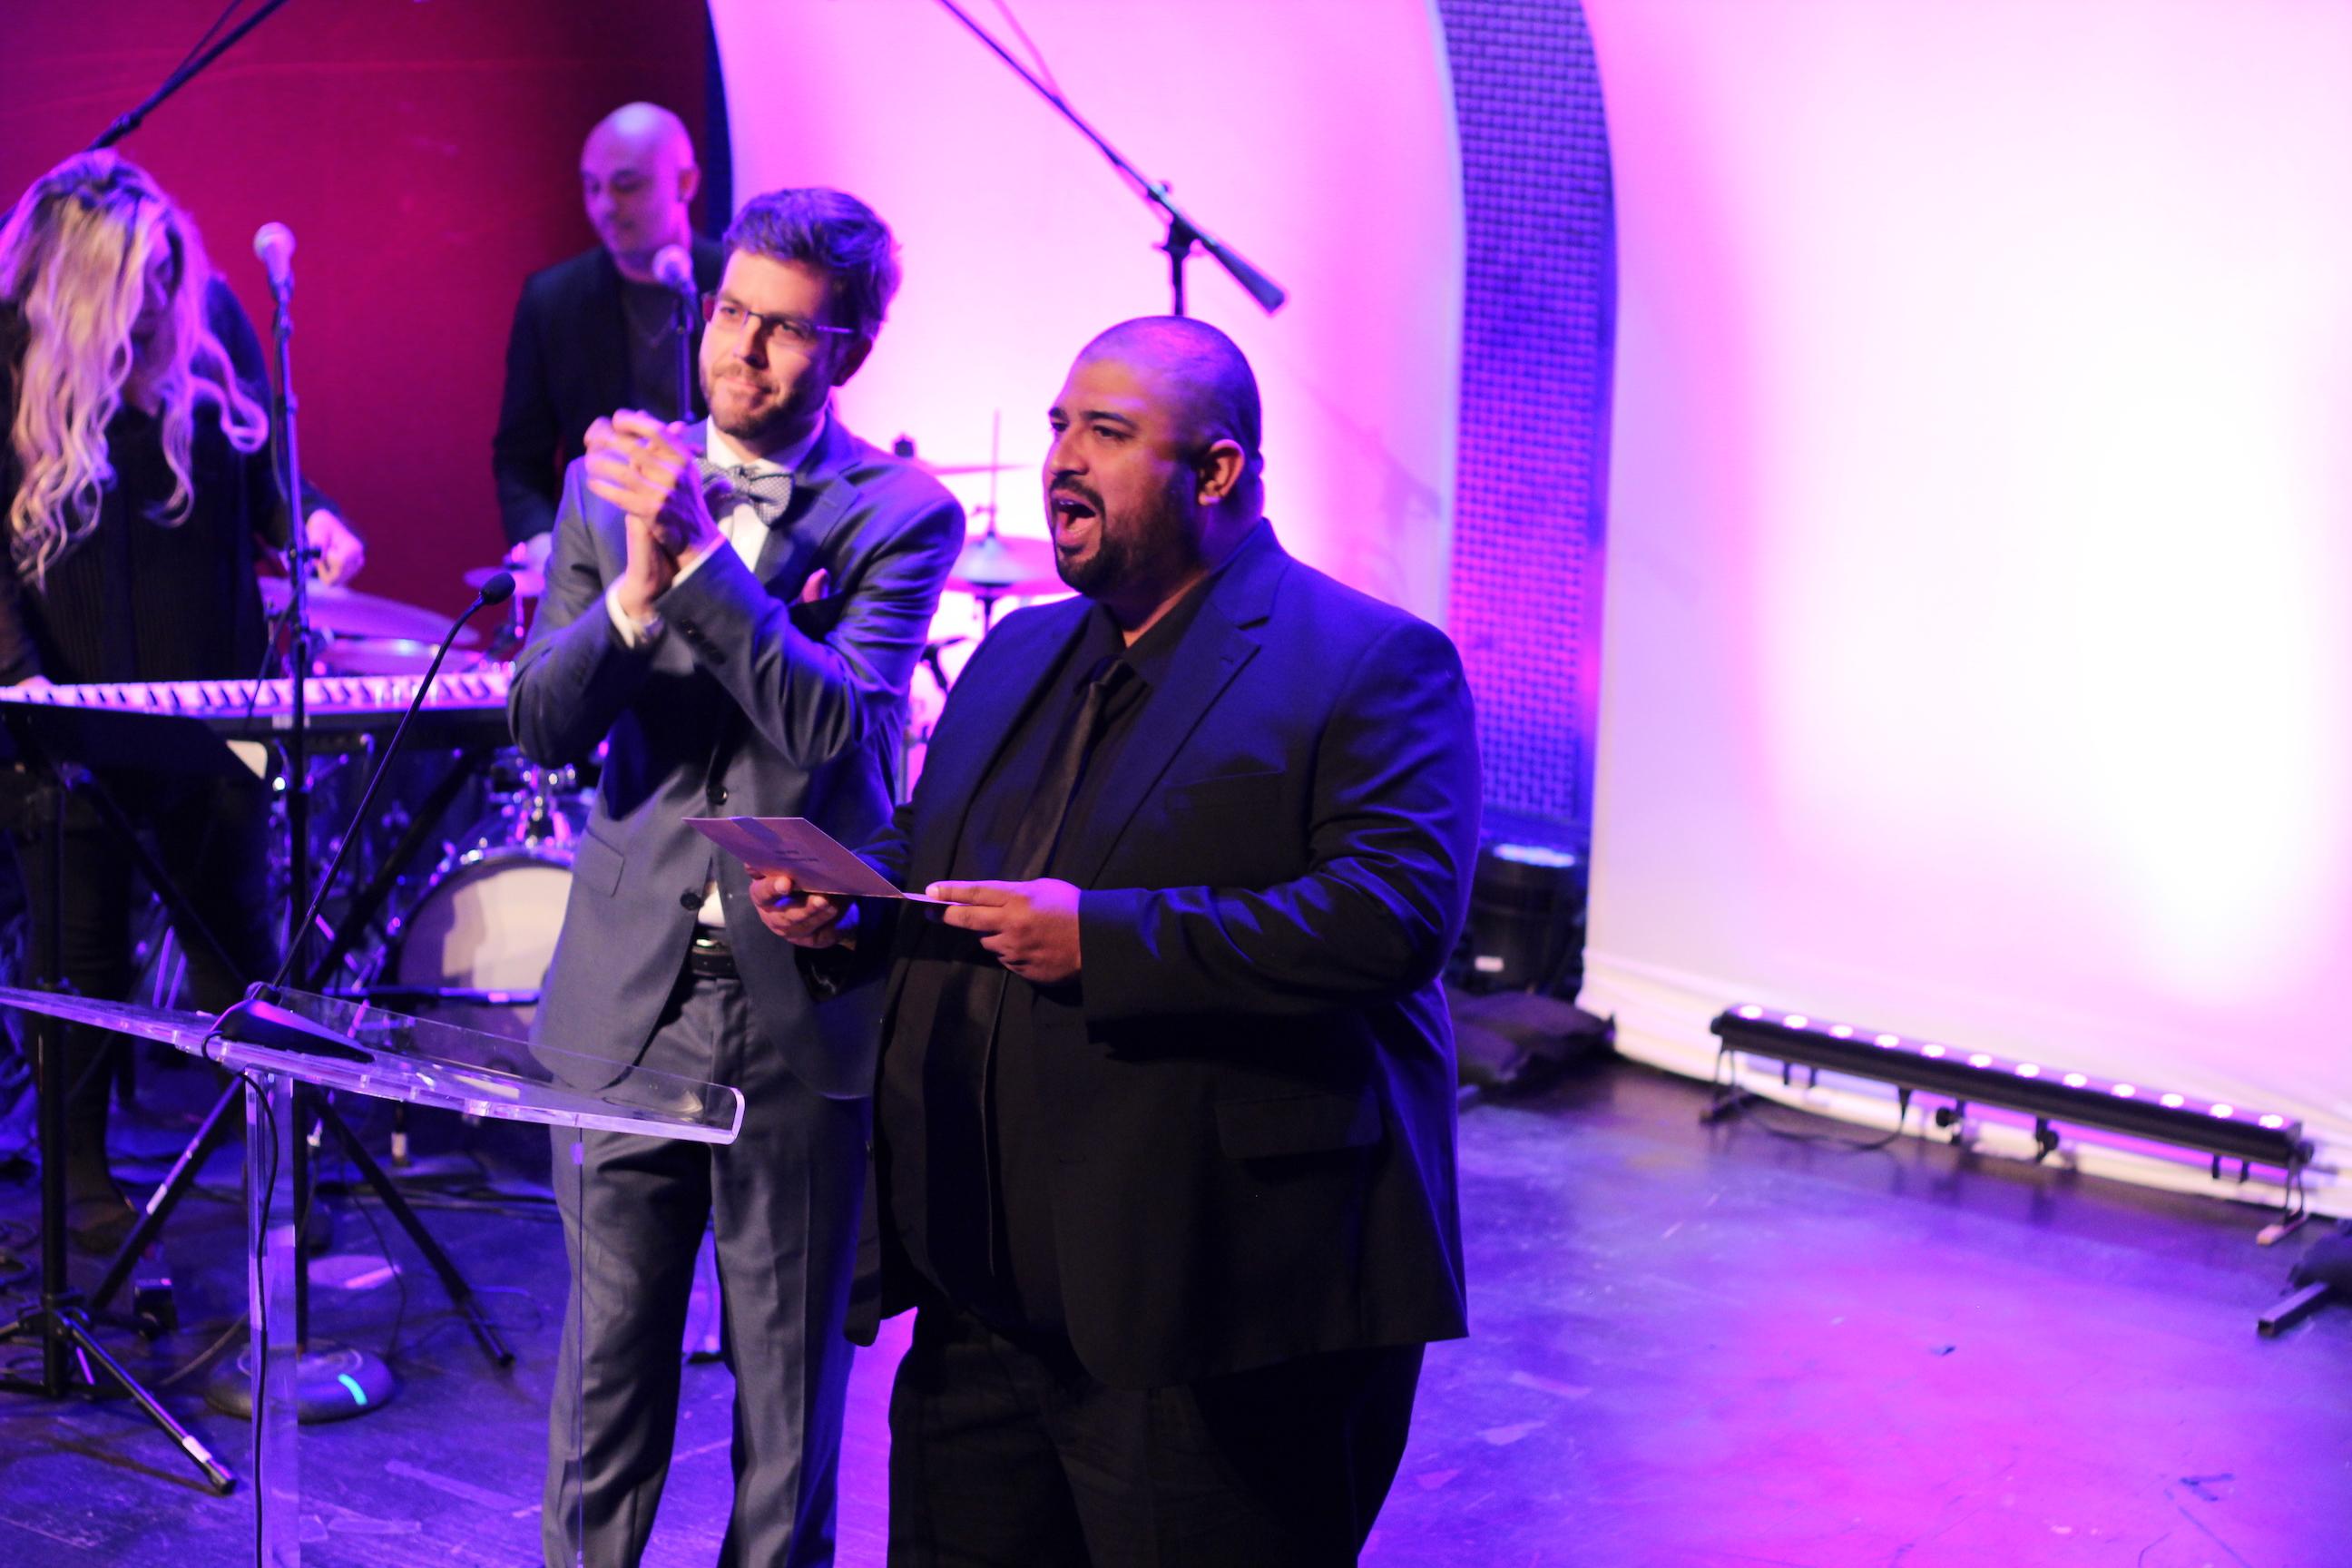 David Fernandez Jr., Art Neill, and Nina Leilani Deering at an event for San Diego Film Awards (2017)